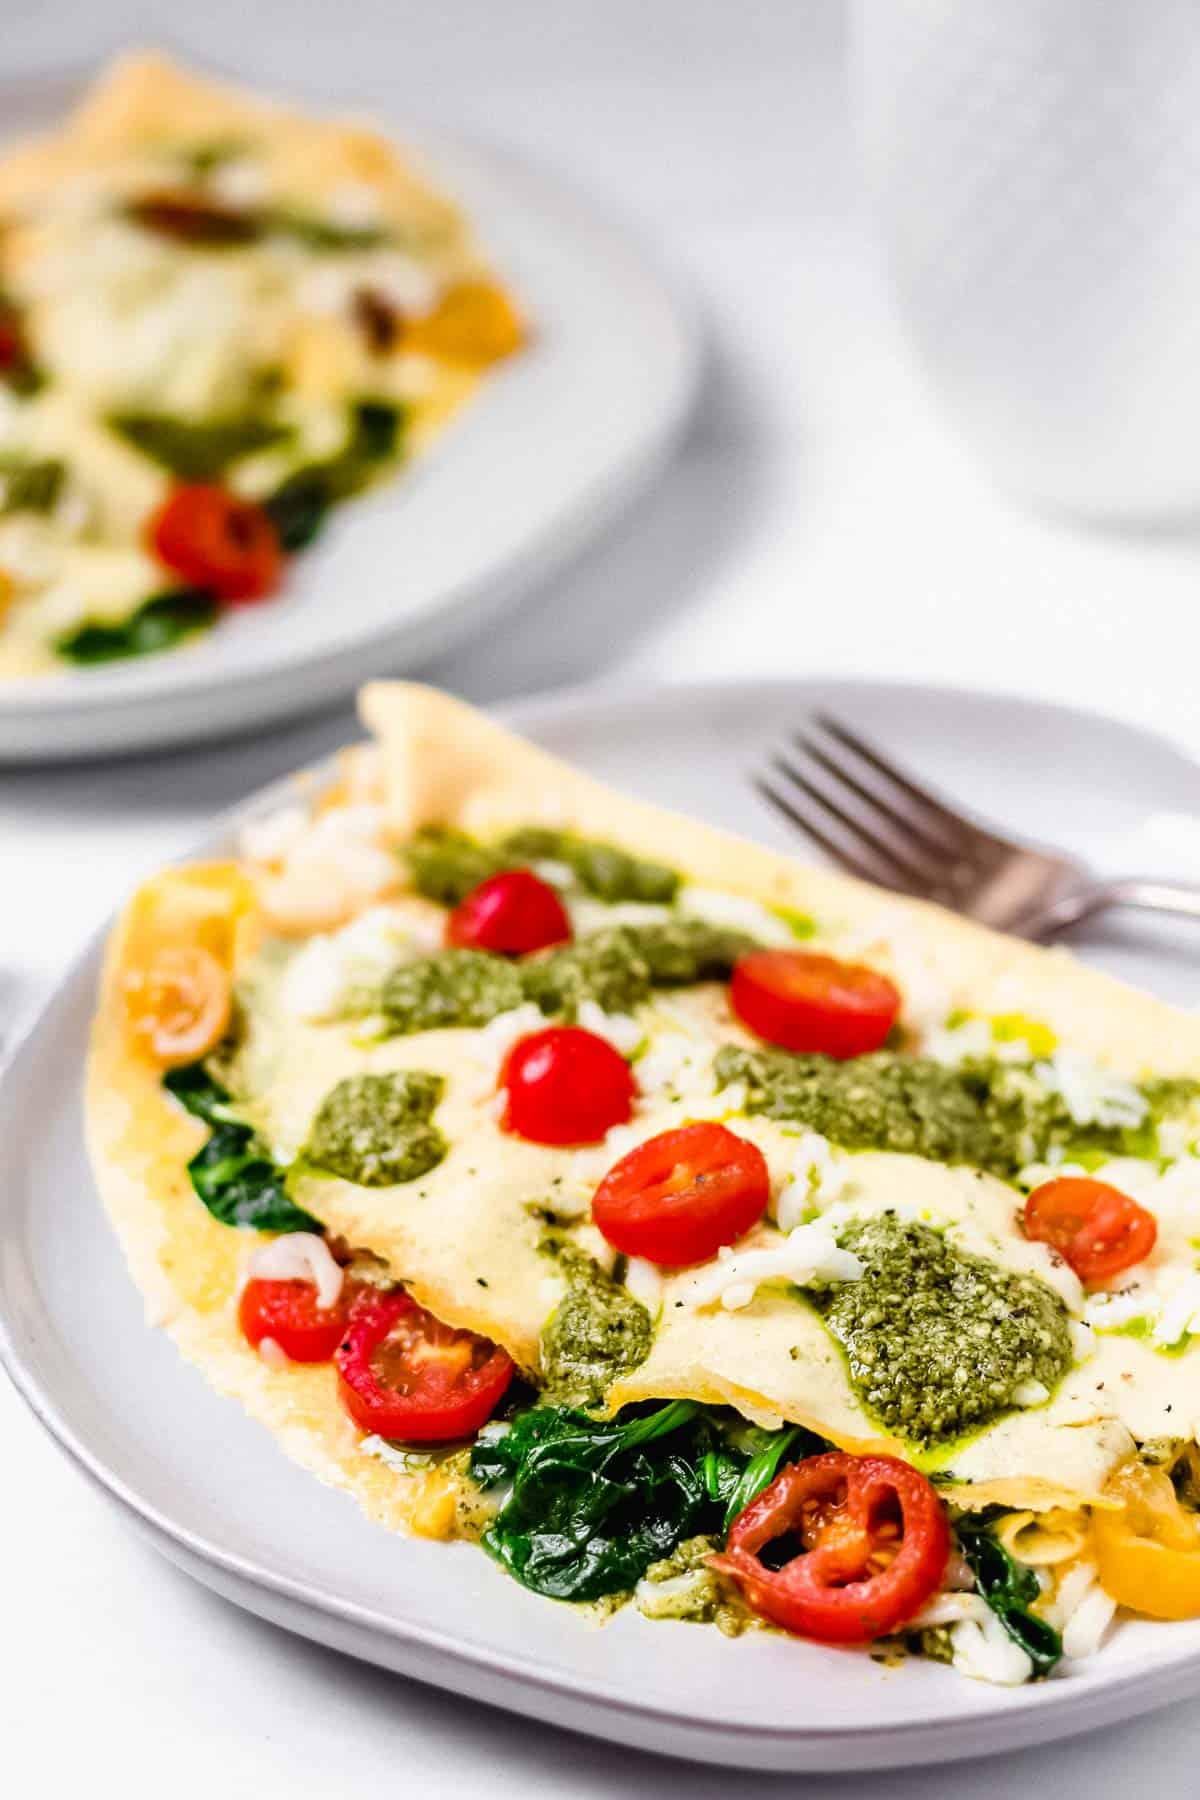 Pesto Caprese Omelet with Mozzarella Cheese and Cherry Tomatoes on white plates on a white backdrop